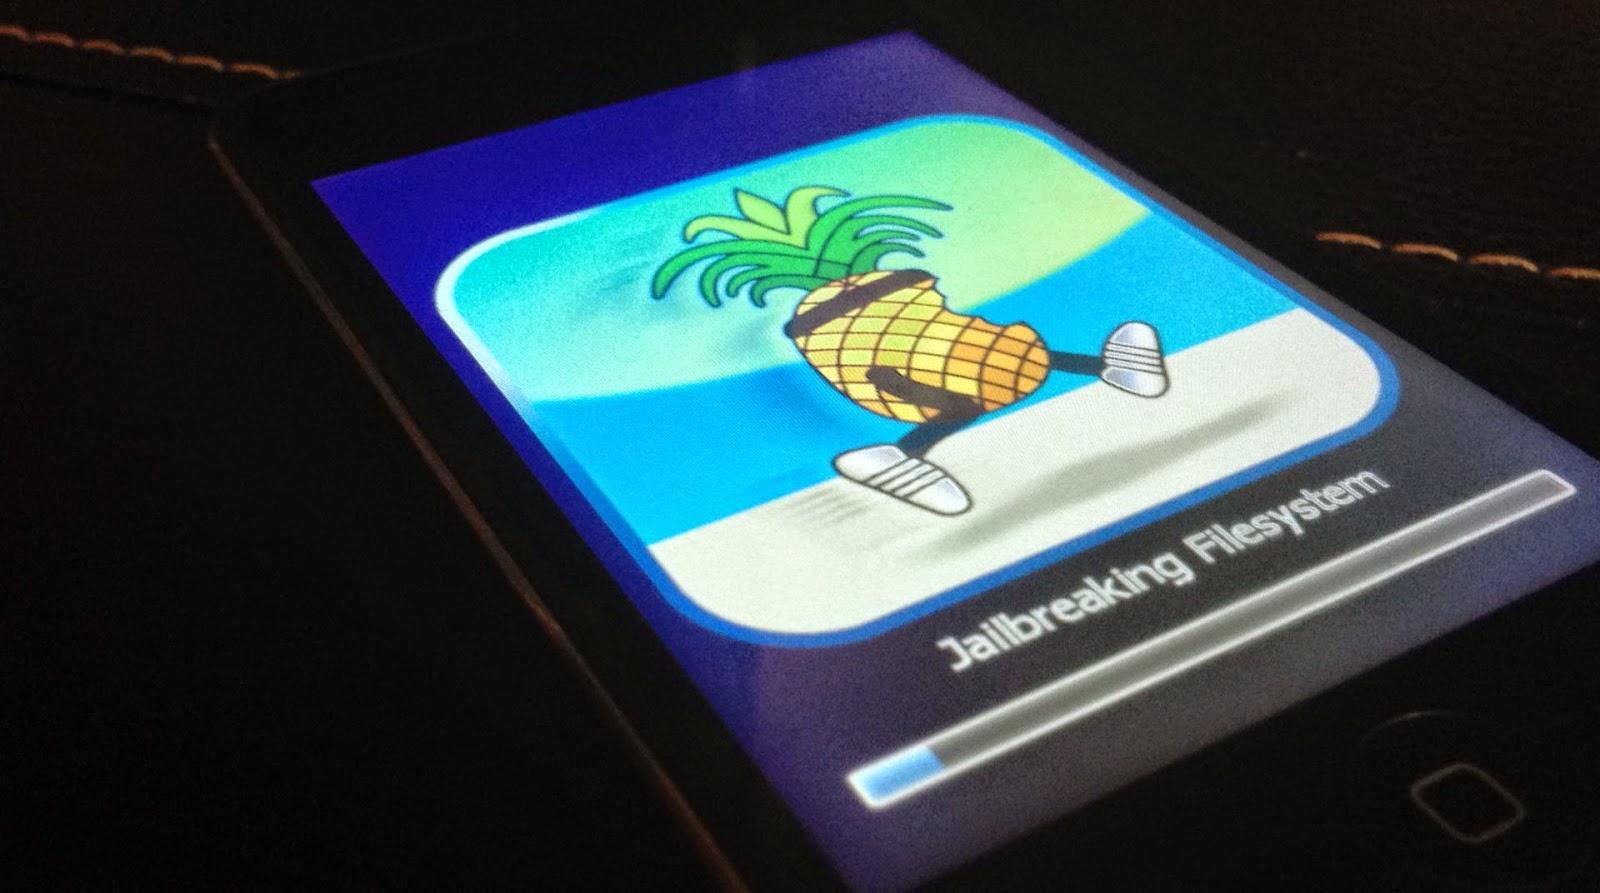 Привязанный джейлбрейк iOS 6.0/6.0.1 для A4 (iPhone 3GS, 4, iPod Touch 4G)